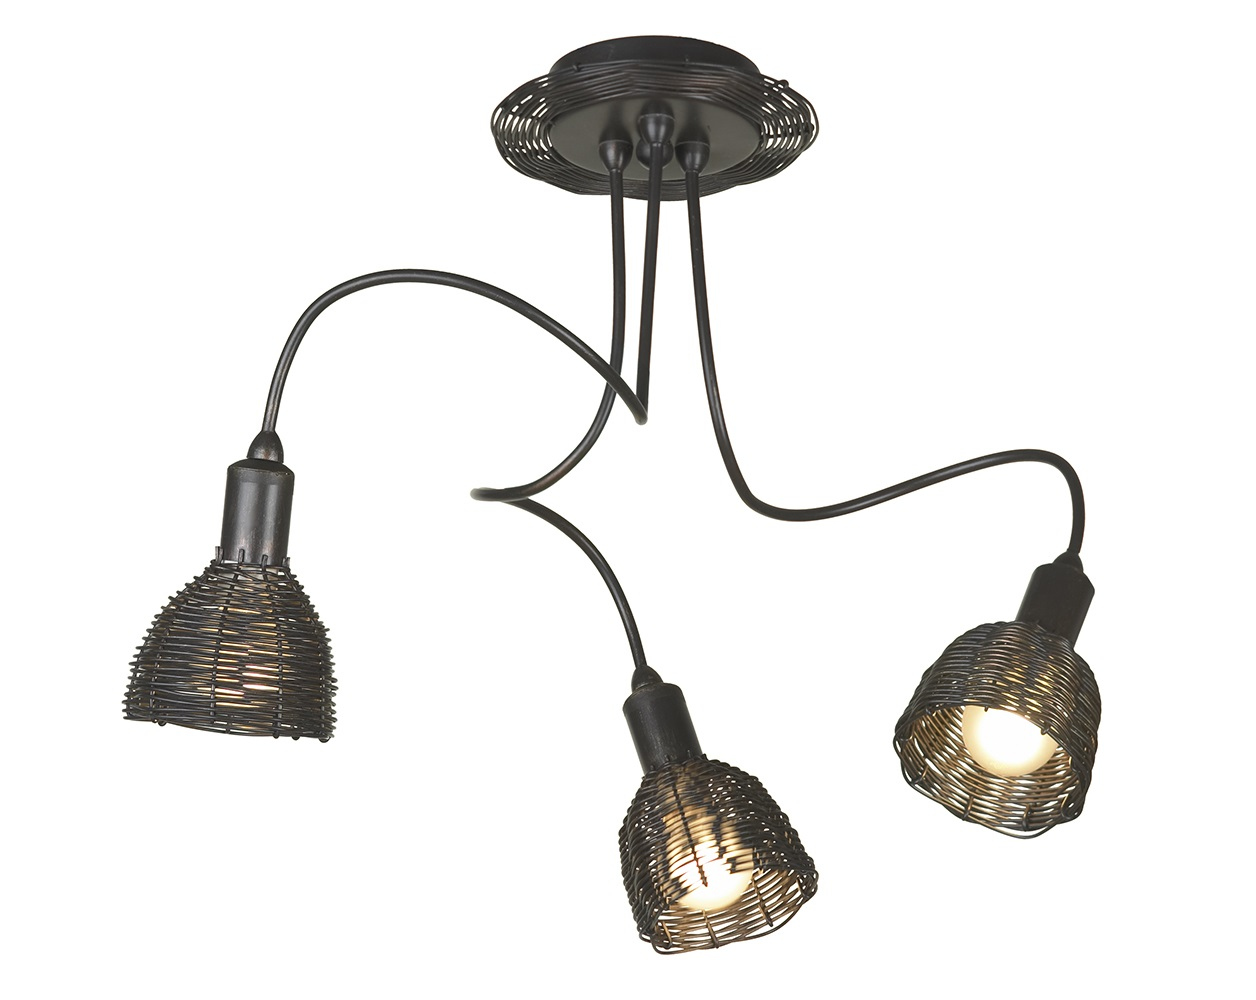 Потолочный светильникПотолочные светильники<br>&amp;lt;div&amp;gt;Вид цоколя: E14&amp;lt;/div&amp;gt;&amp;lt;div&amp;gt;Мощность: 40W&amp;lt;/div&amp;gt;&amp;lt;div&amp;gt;Количество ламп: 3&amp;lt;/div&amp;gt;&amp;lt;div&amp;gt;Лампочка в комплекте: нет&amp;lt;/div&amp;gt;<br><br>Material: Металл<br>Высота см: 35